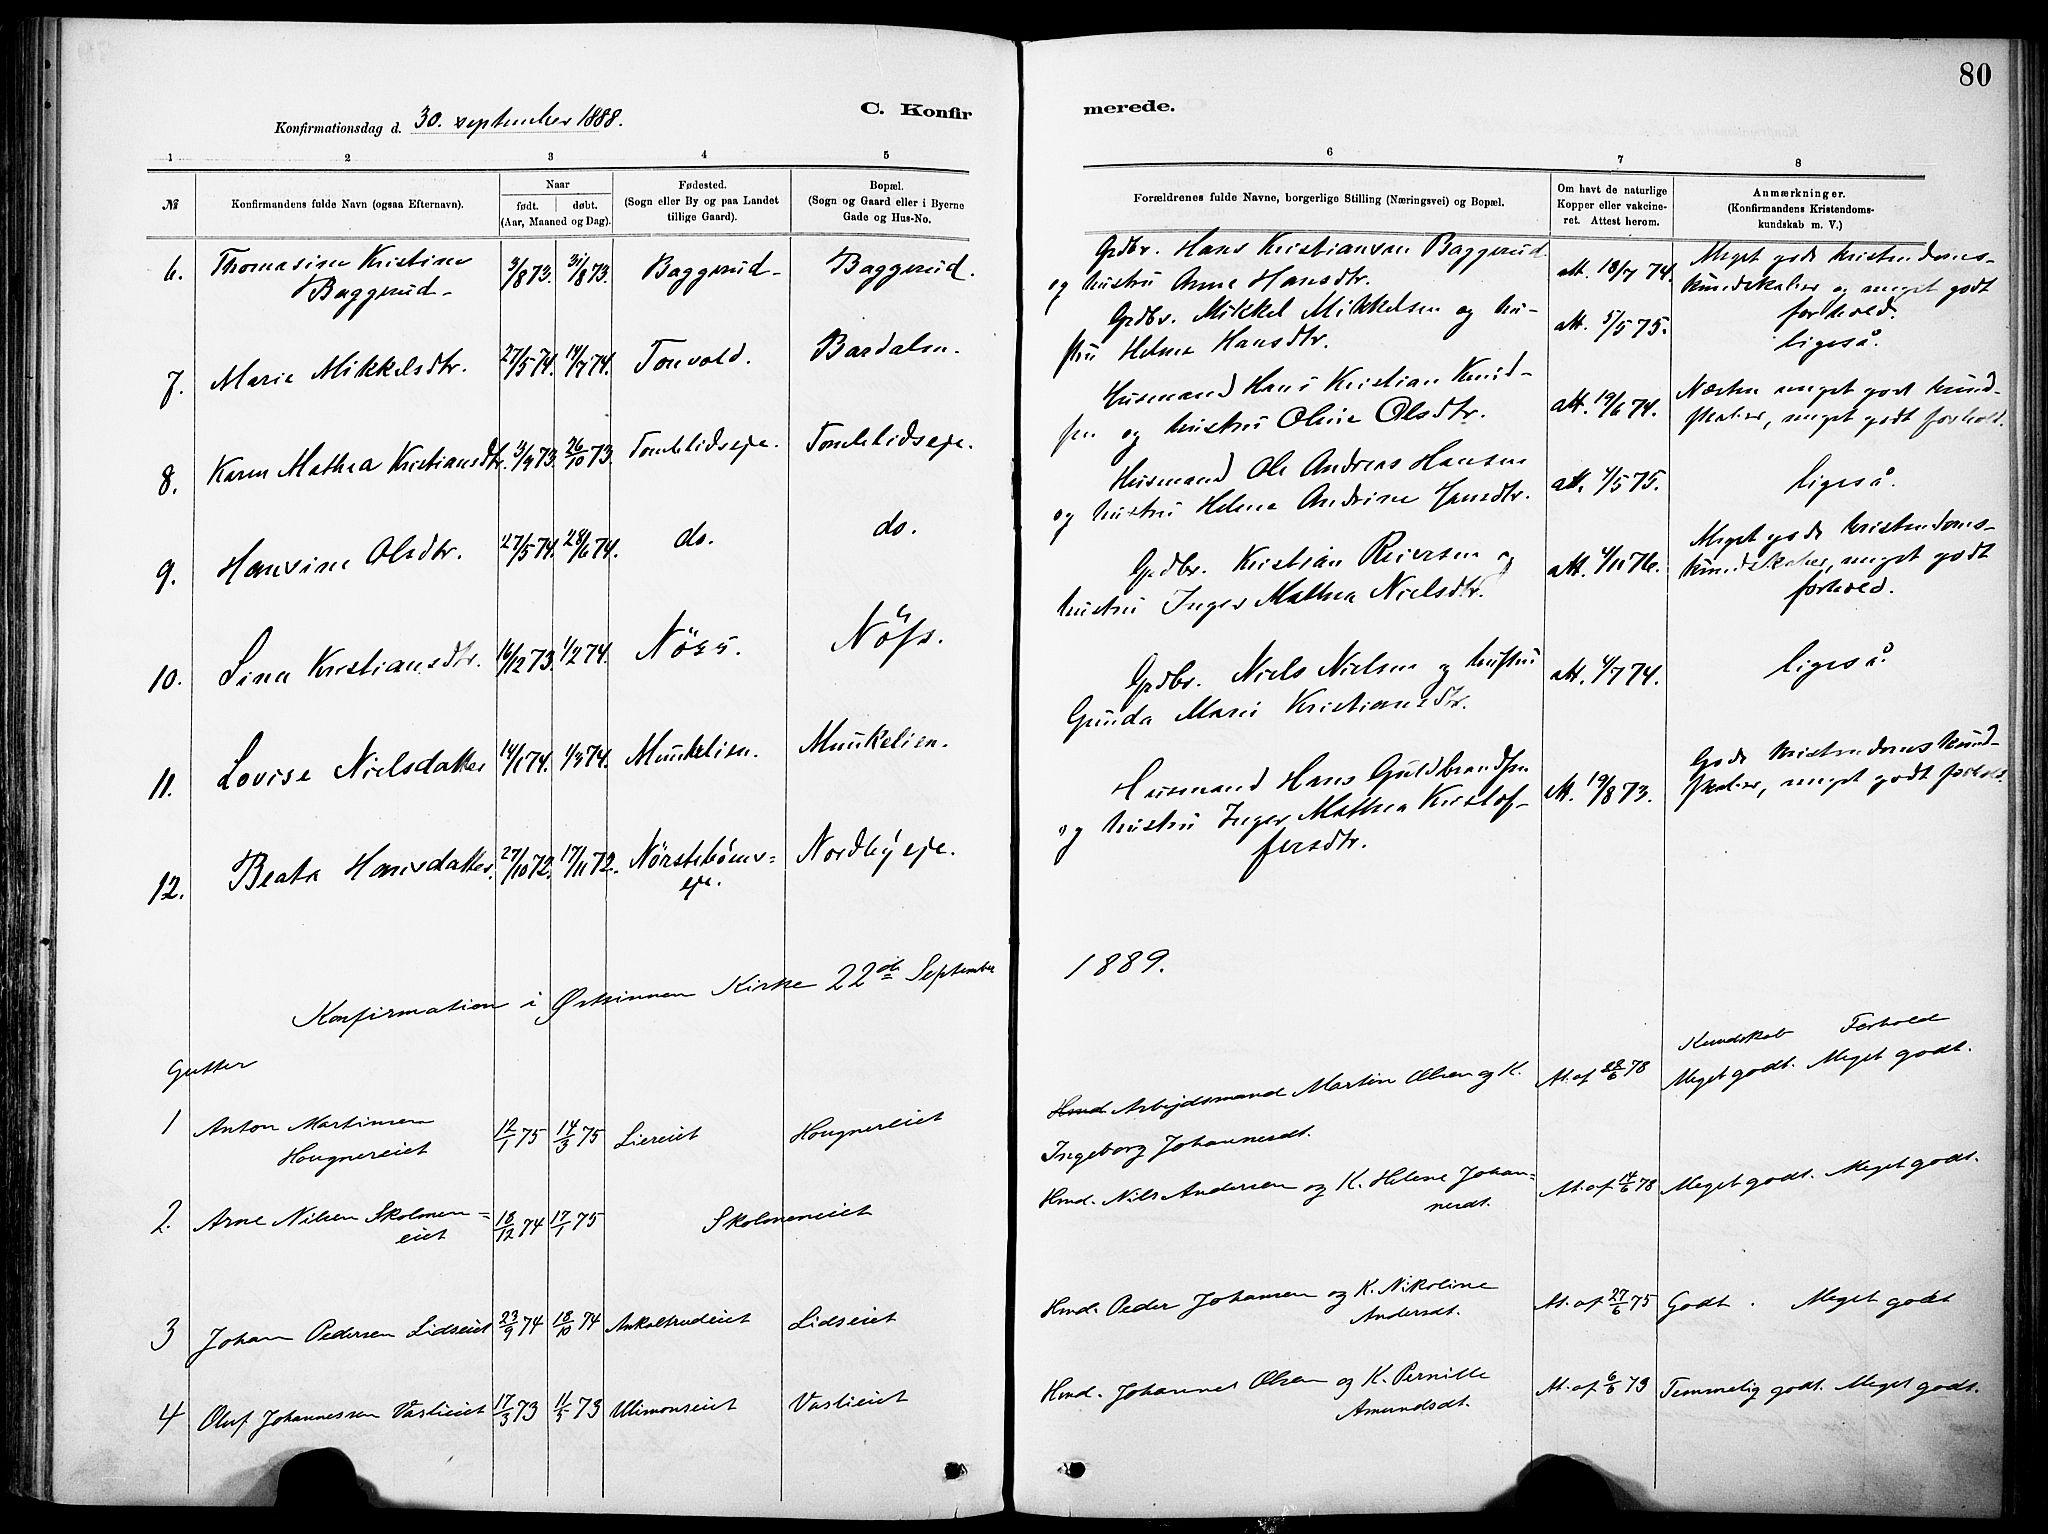 SAH, Nordre Land prestekontor, Ministerialbok nr. 5, 1882-1903, s. 80